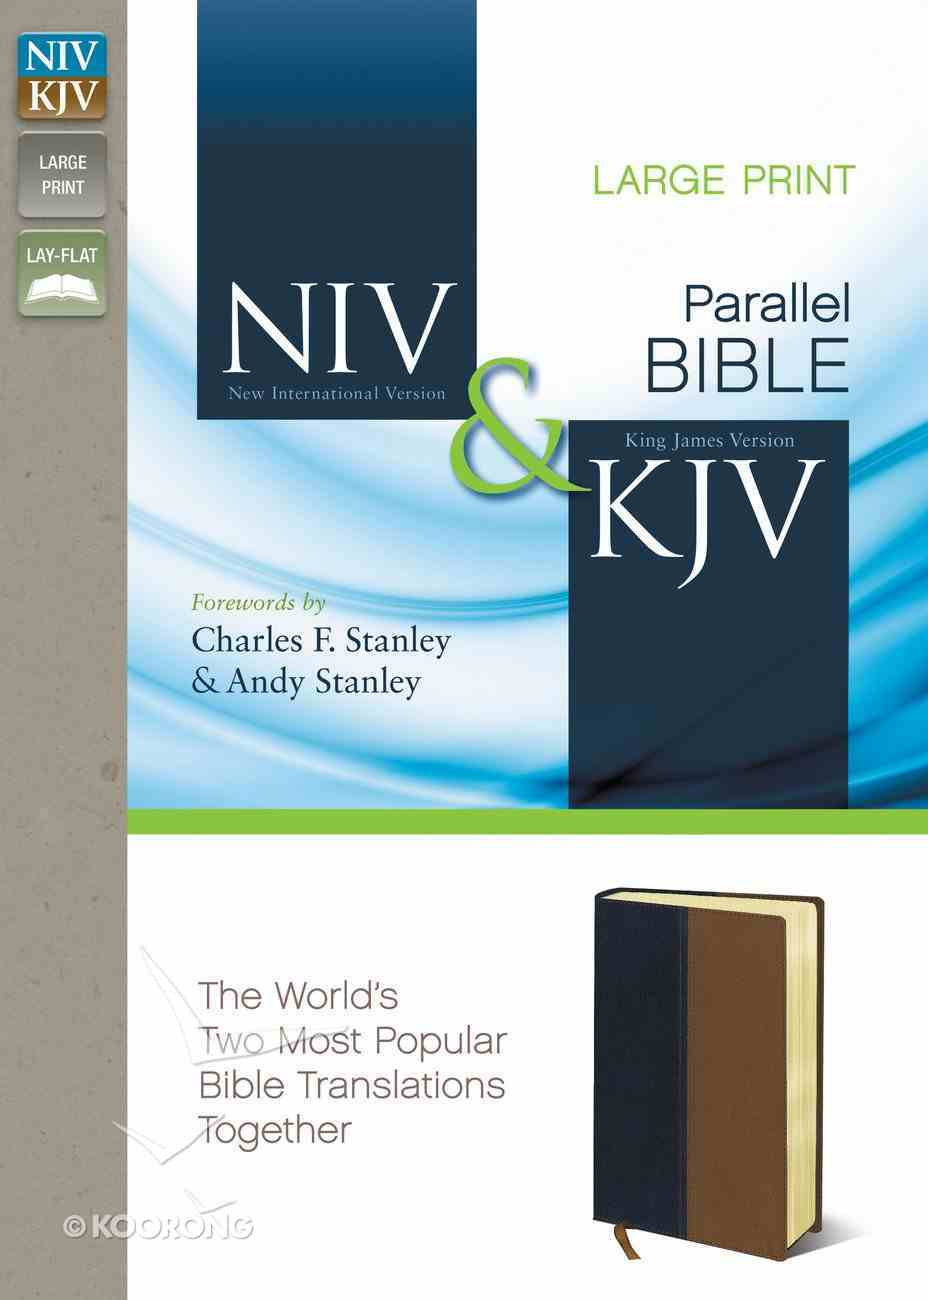 Niv/Kjv Side-By-Side Bible Large Print Navy/Tan (Black Letter Edition) Premium Imitation Leather